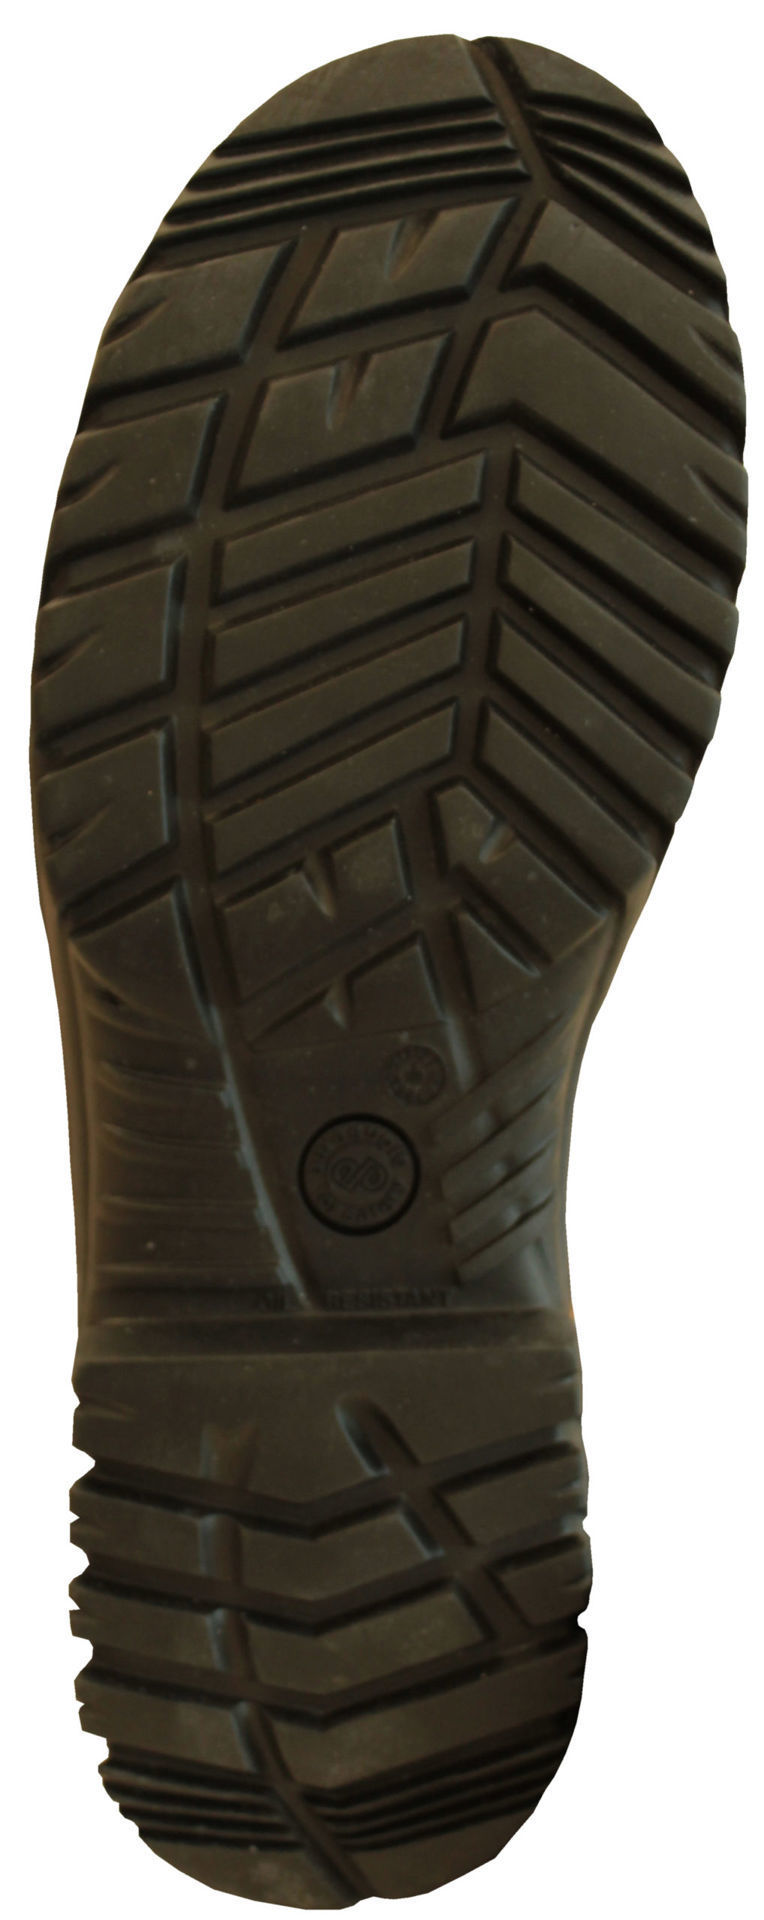 Image de Mythen Chaussure de travail, Waterproof